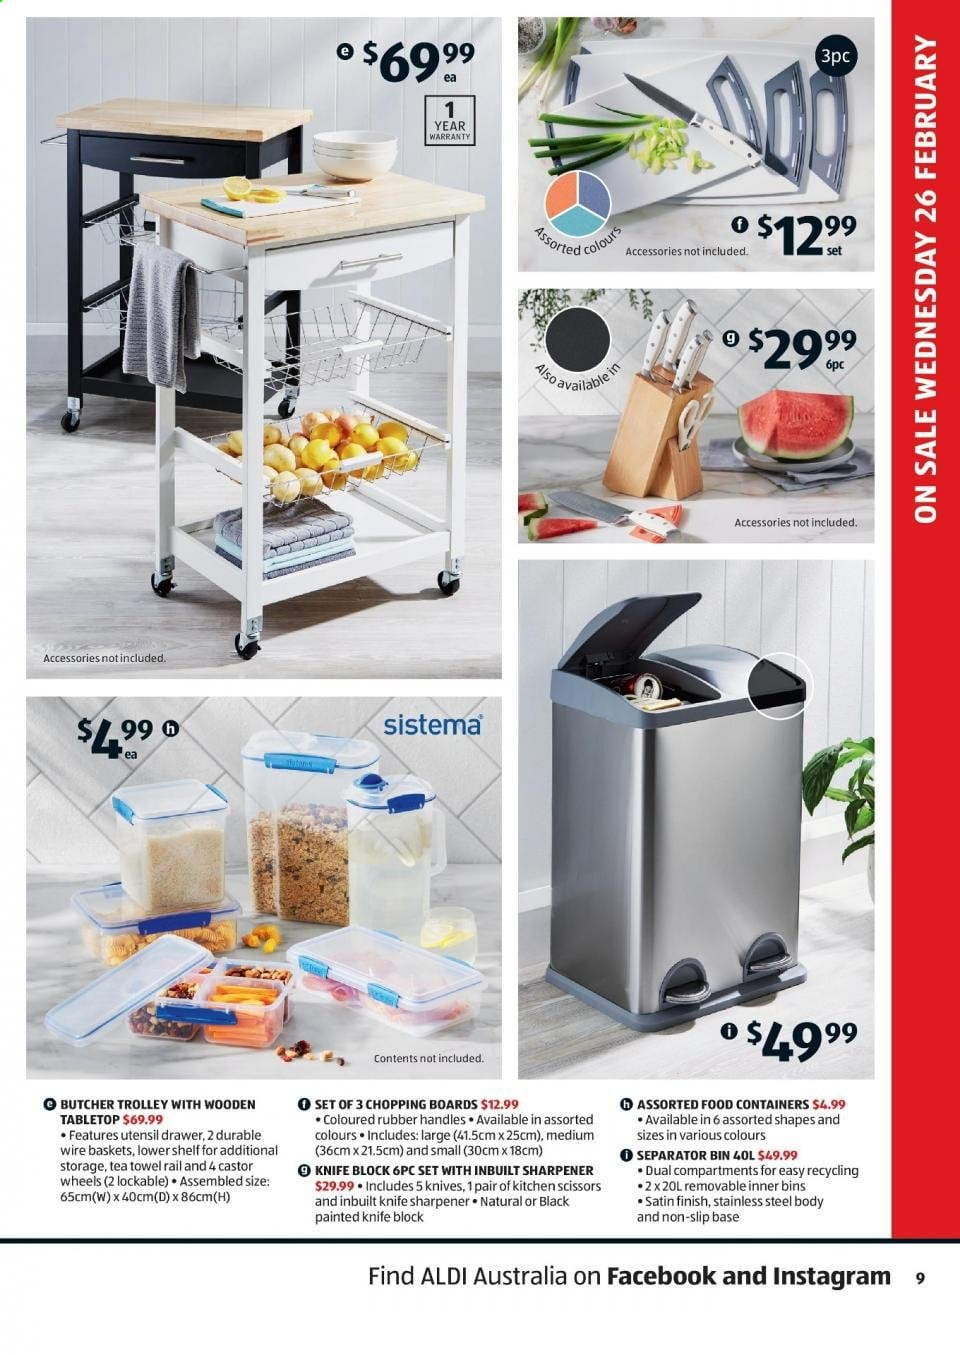 Aldi Special Buys Feb